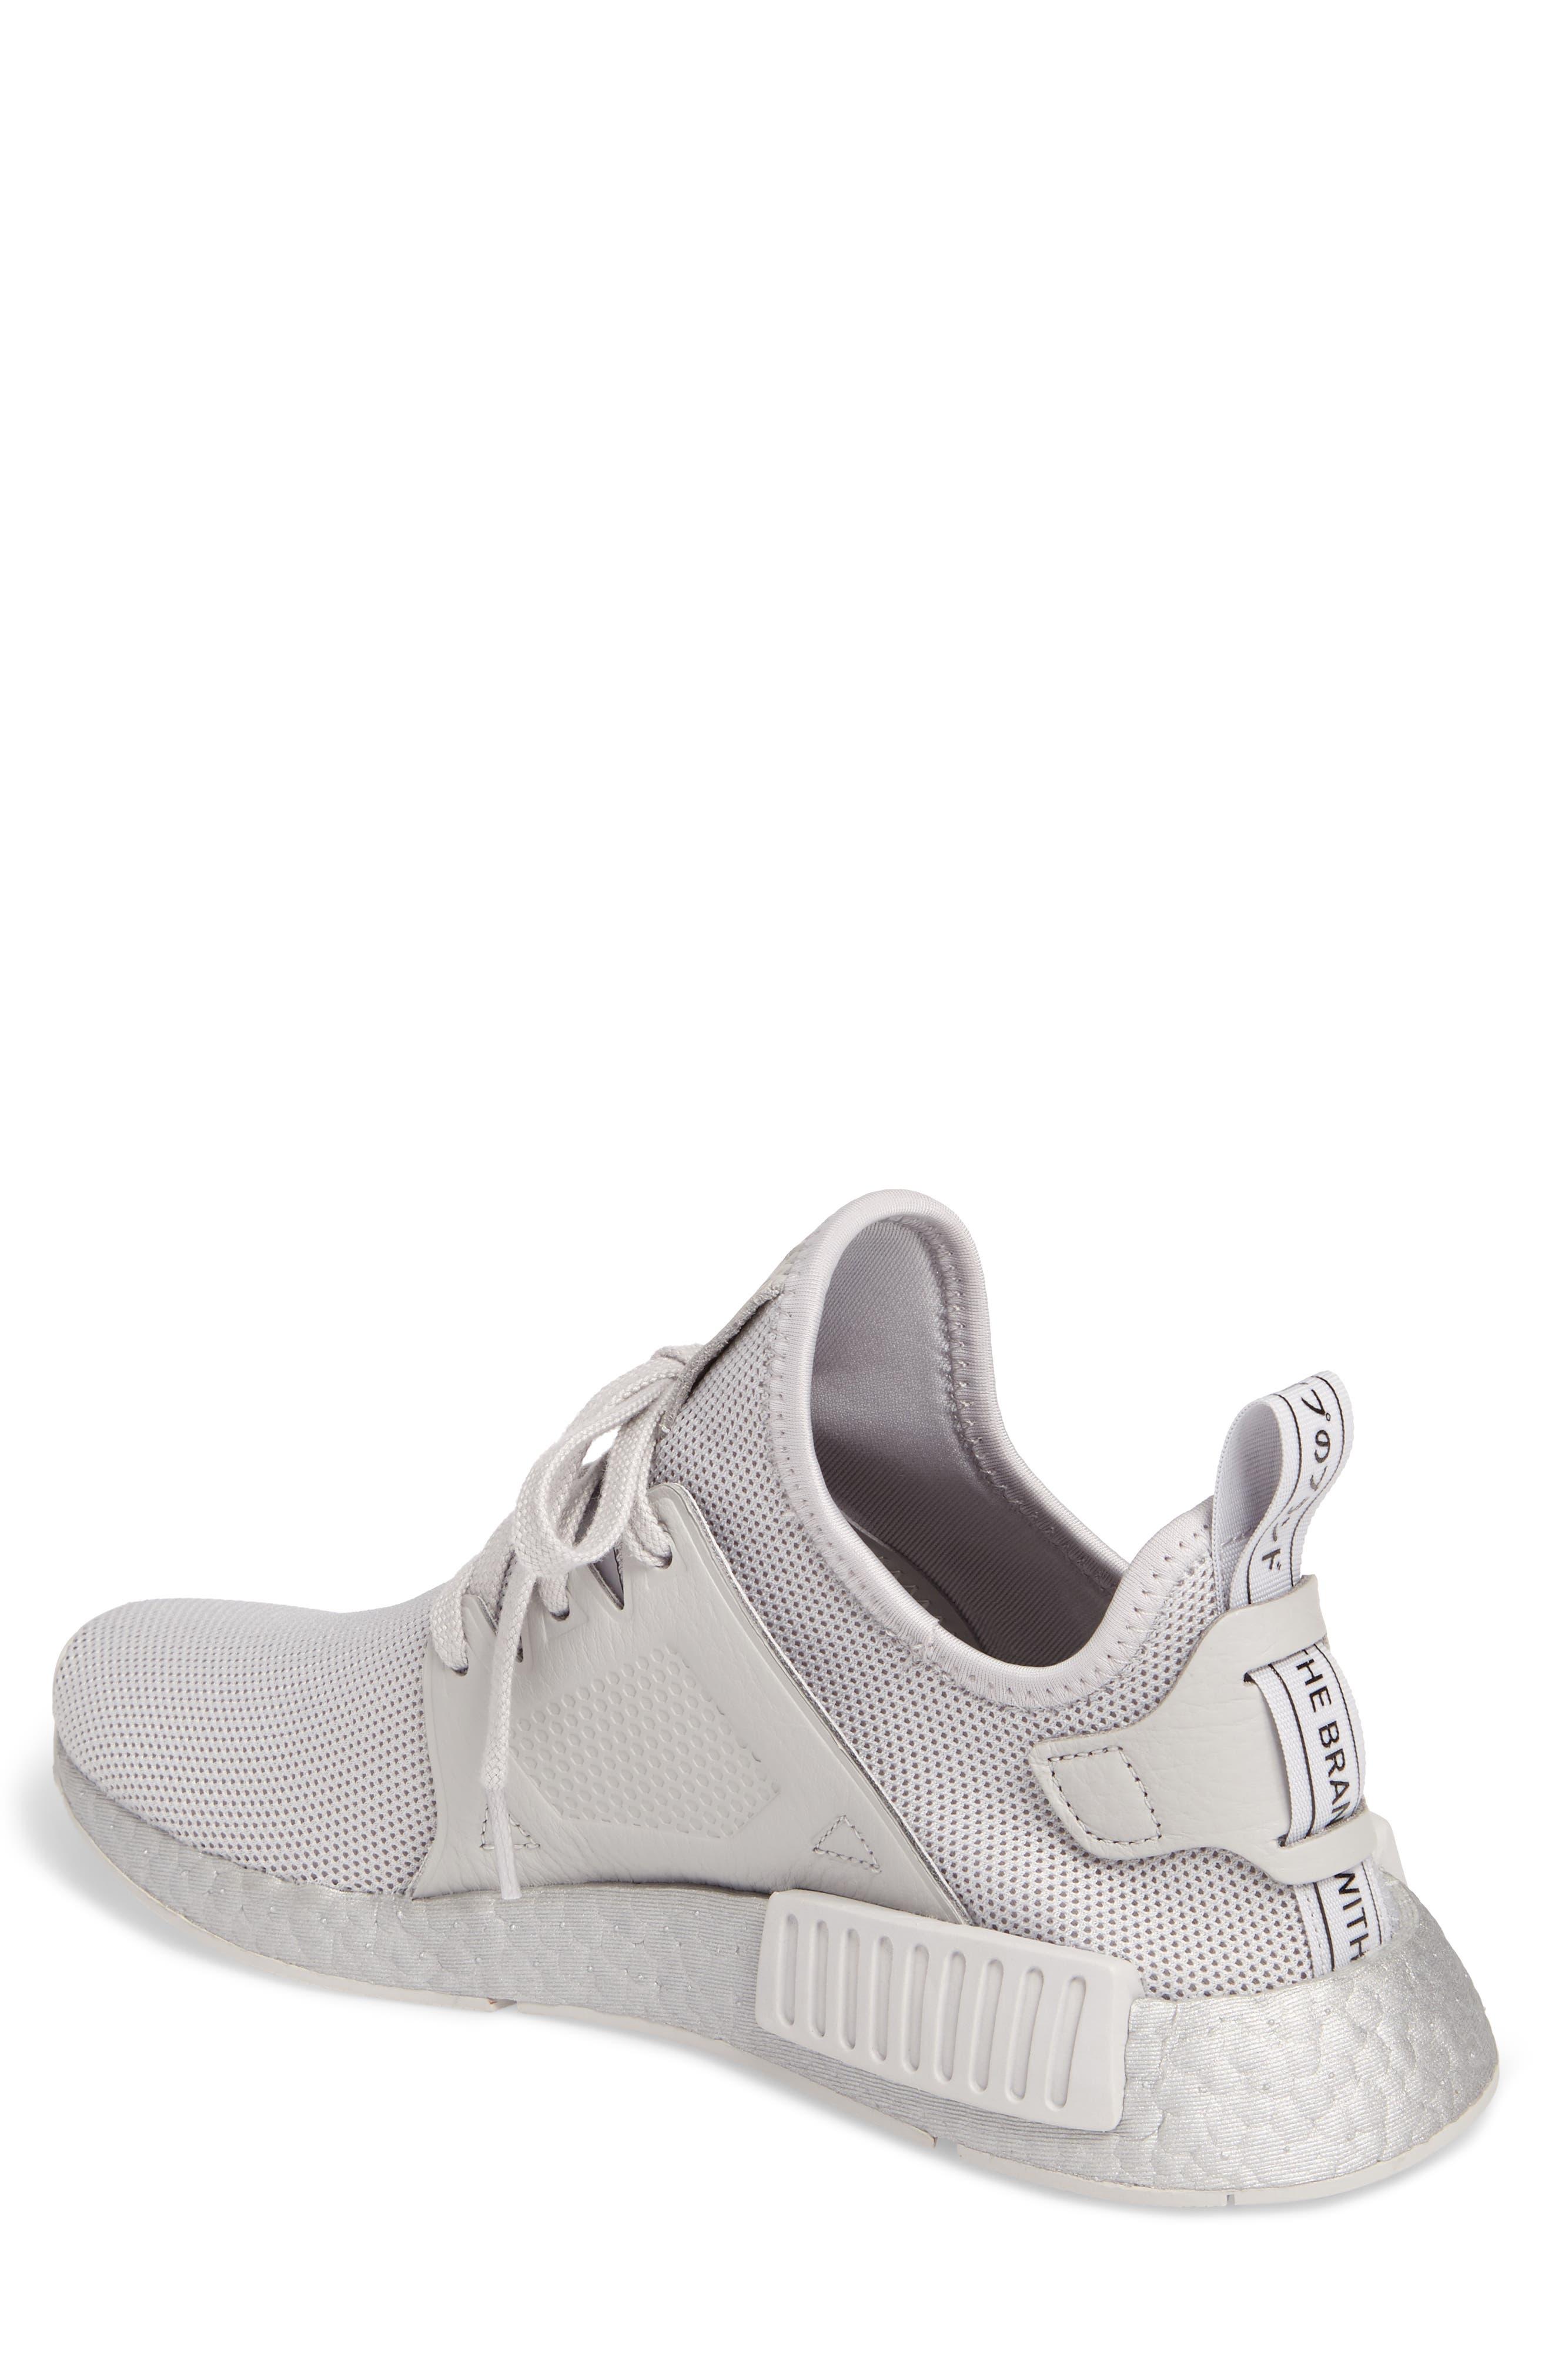 NMD XR1 Sneaker,                             Alternate thumbnail 2, color,                             020